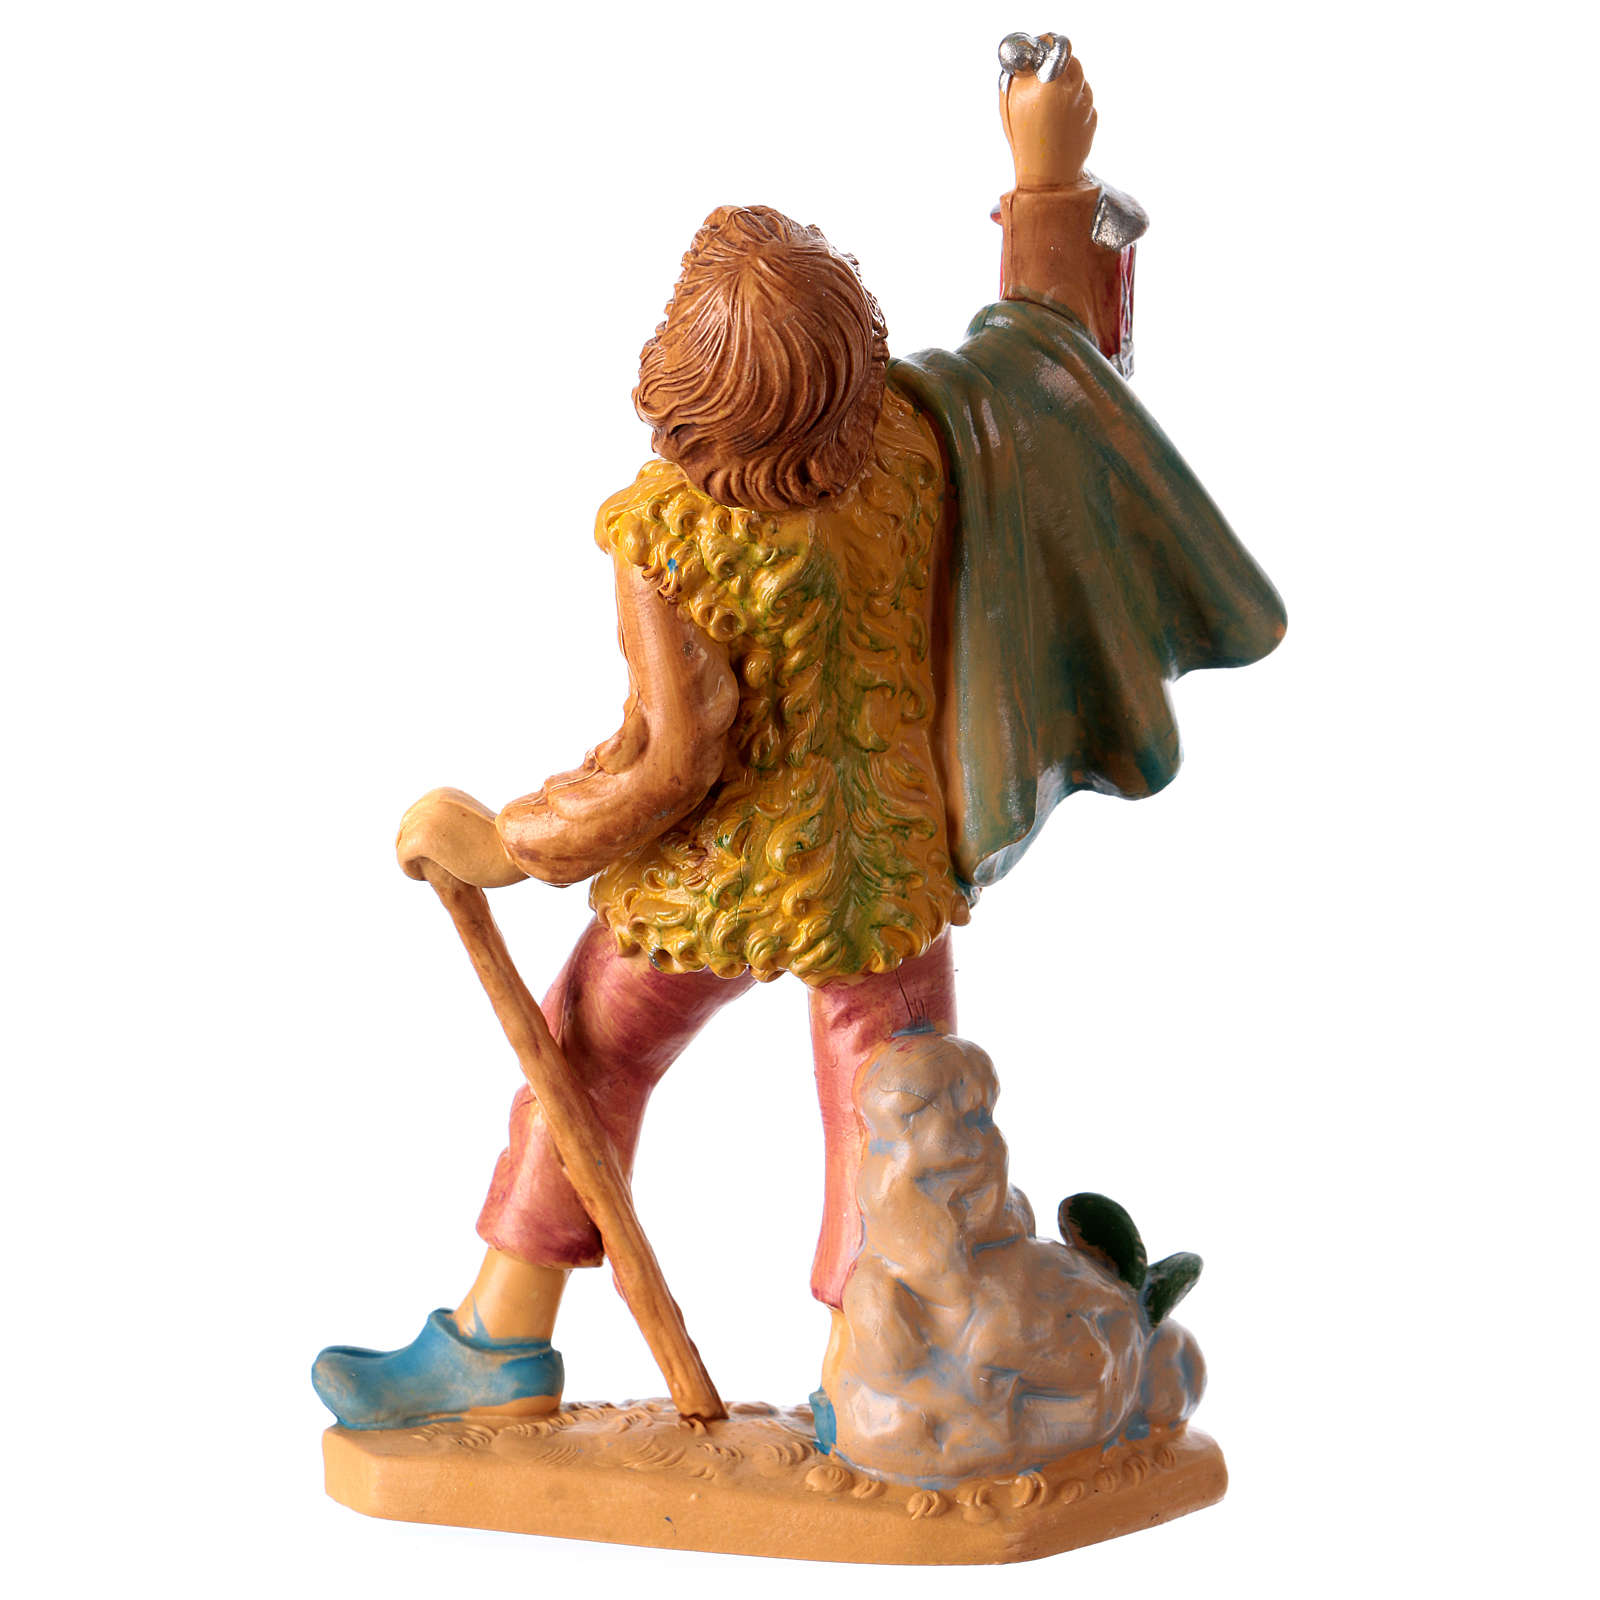 Man with lantern 10 cm for Nativity Scene 3